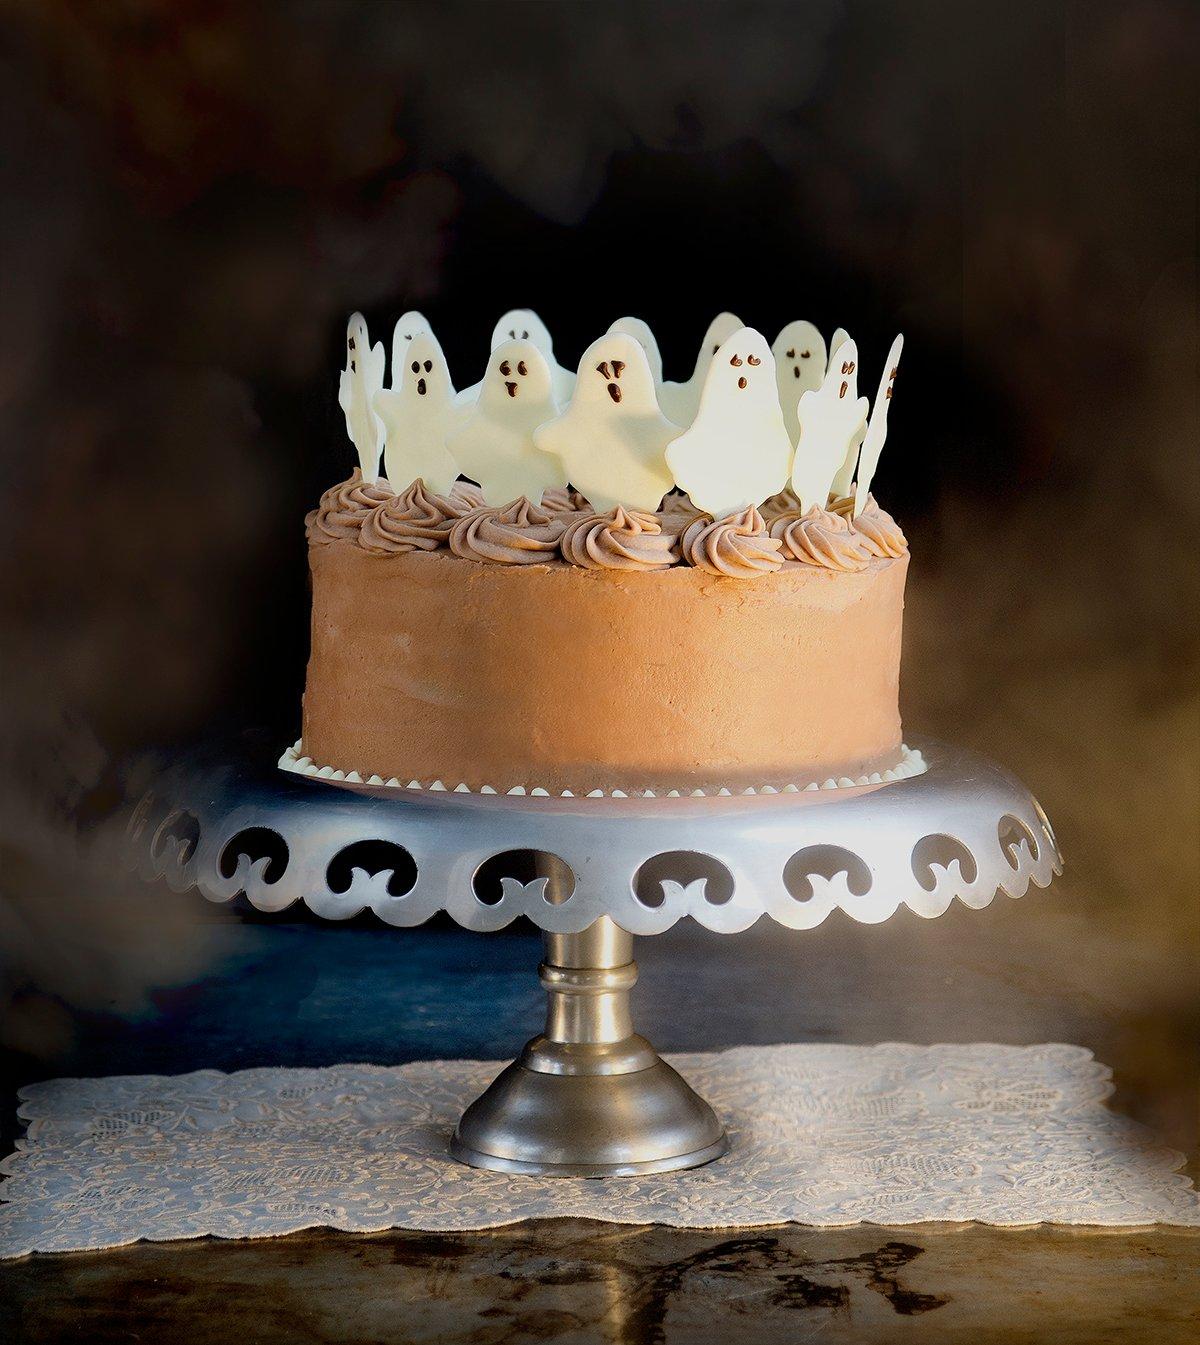 Geister Kuchen zu Halloween